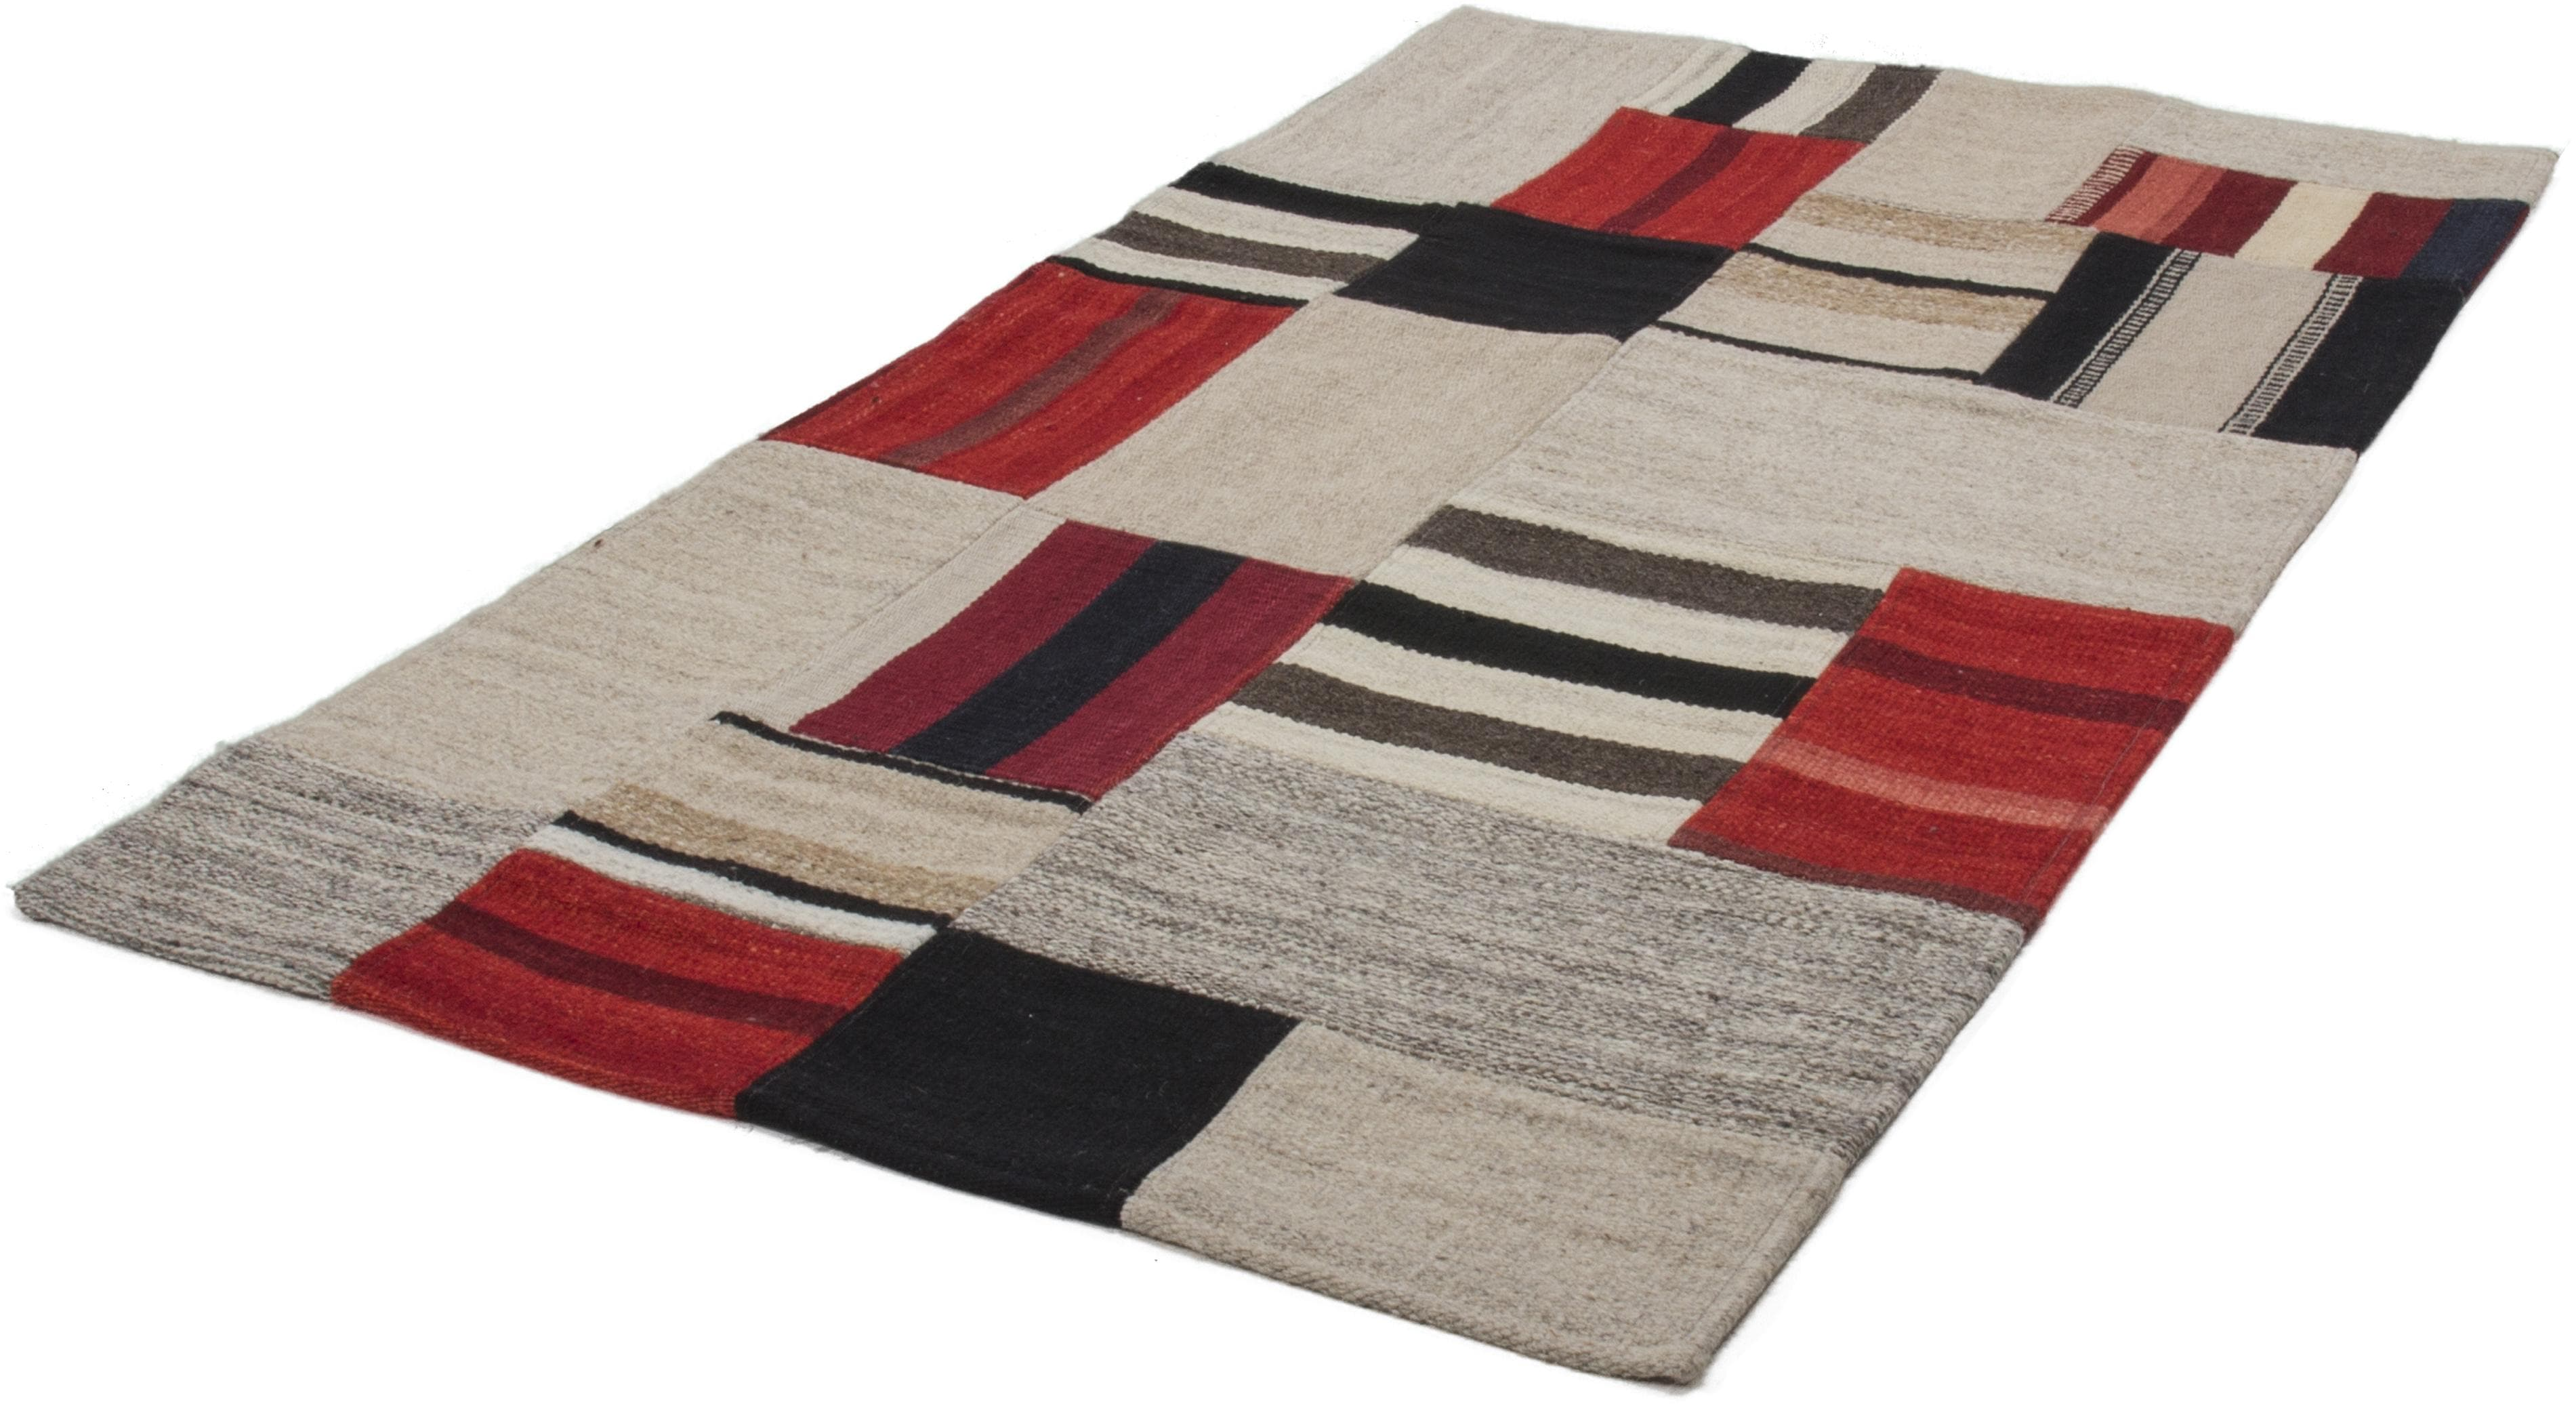 Teppich Radical 240 Kayoom rechteckig Höhe 12 mm handgewebt